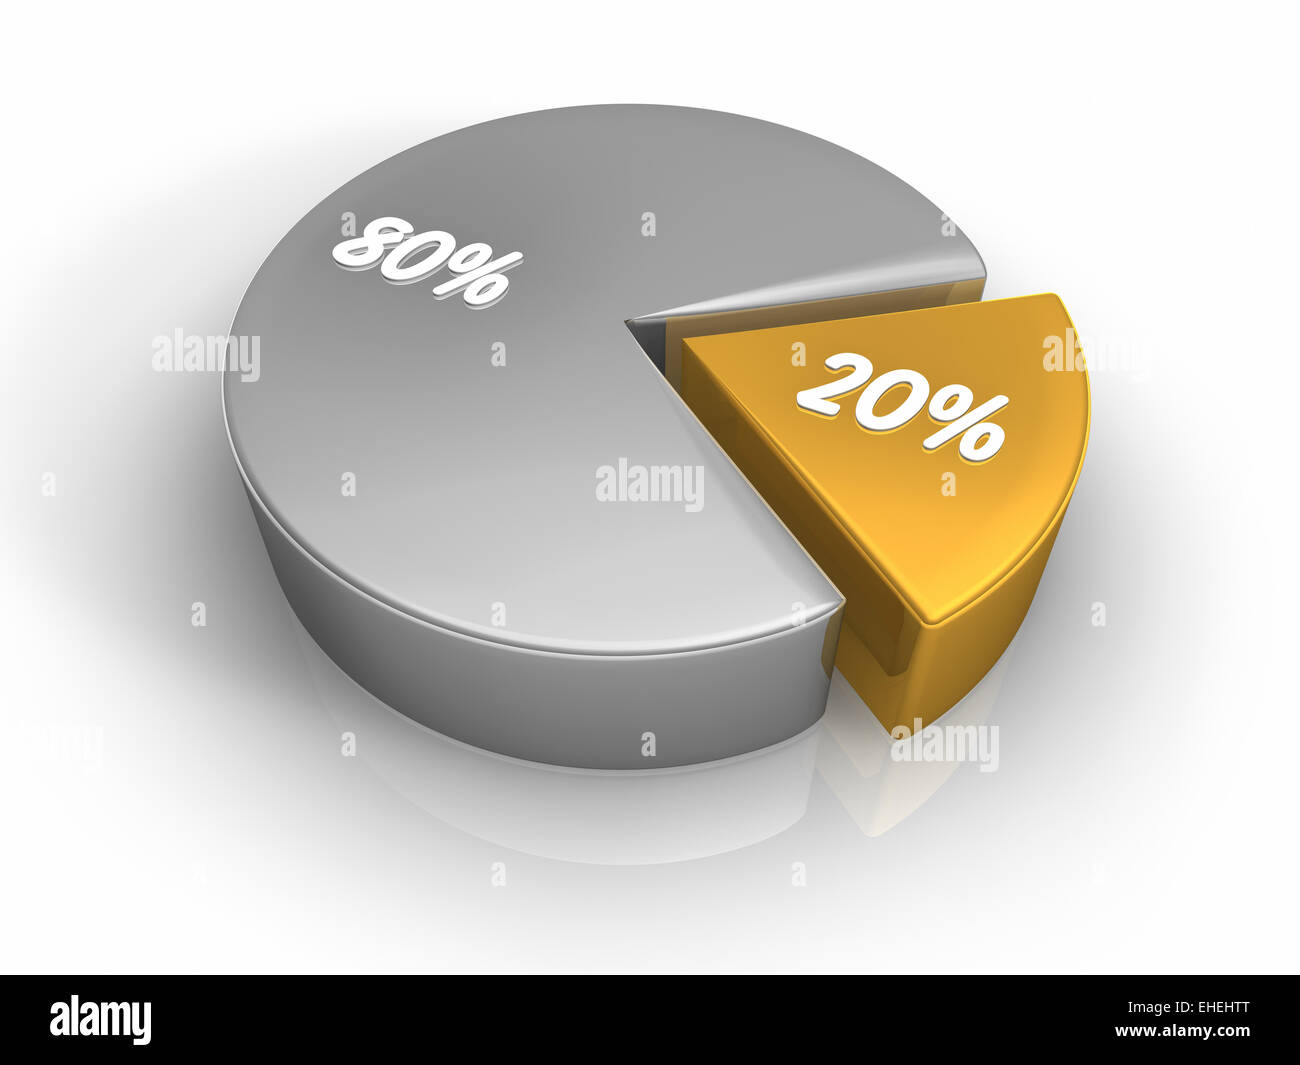 Pie chart 20 80 percent stock photo royalty free image 79611976 pie chart 20 80 percent nvjuhfo Choice Image